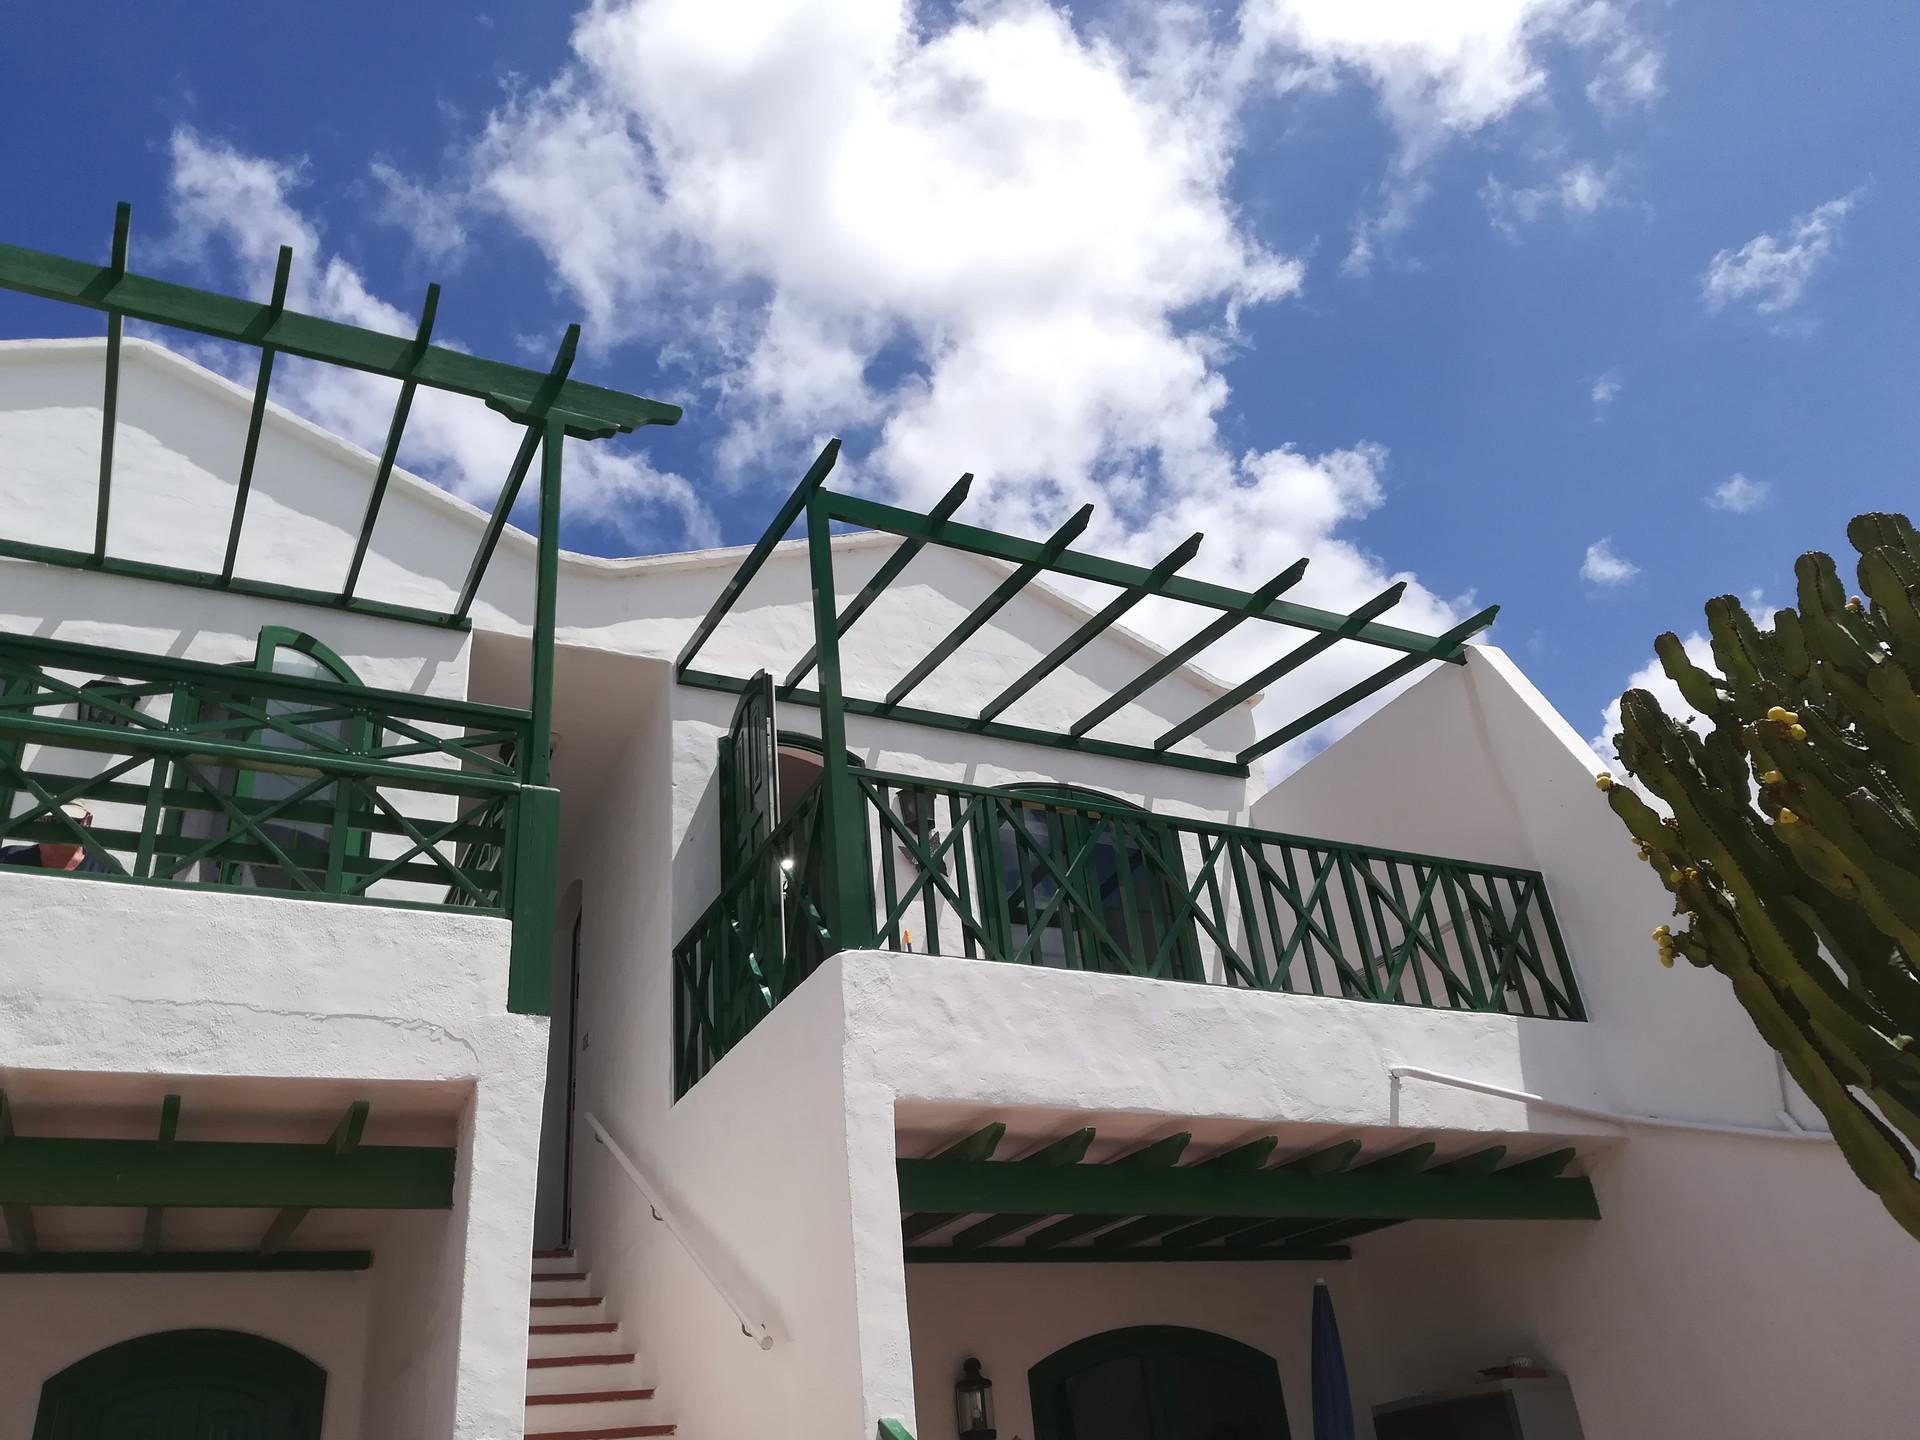 Green pergola structure